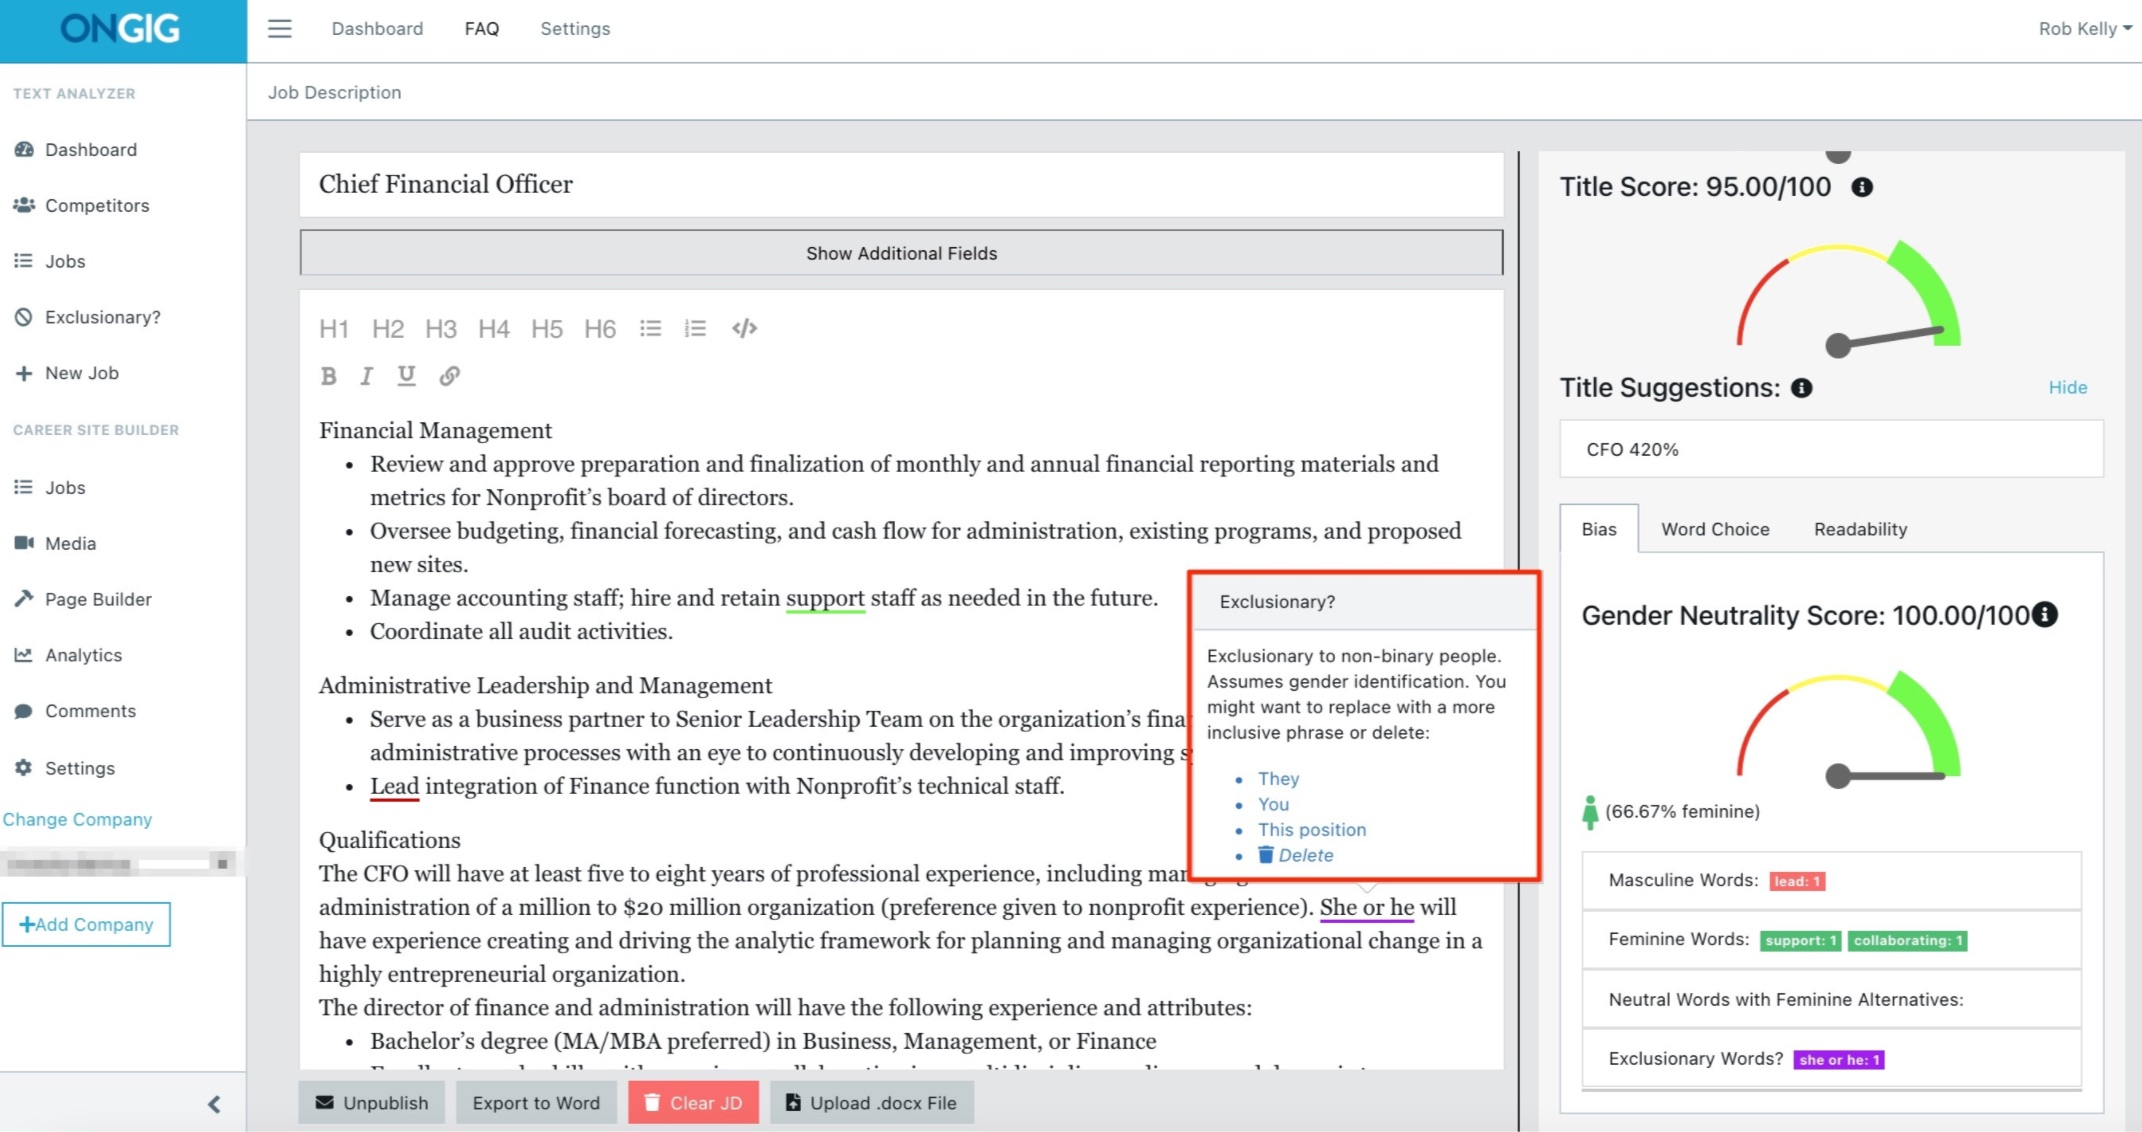 augmented_writing_job_description_tool_lgbtq_bias